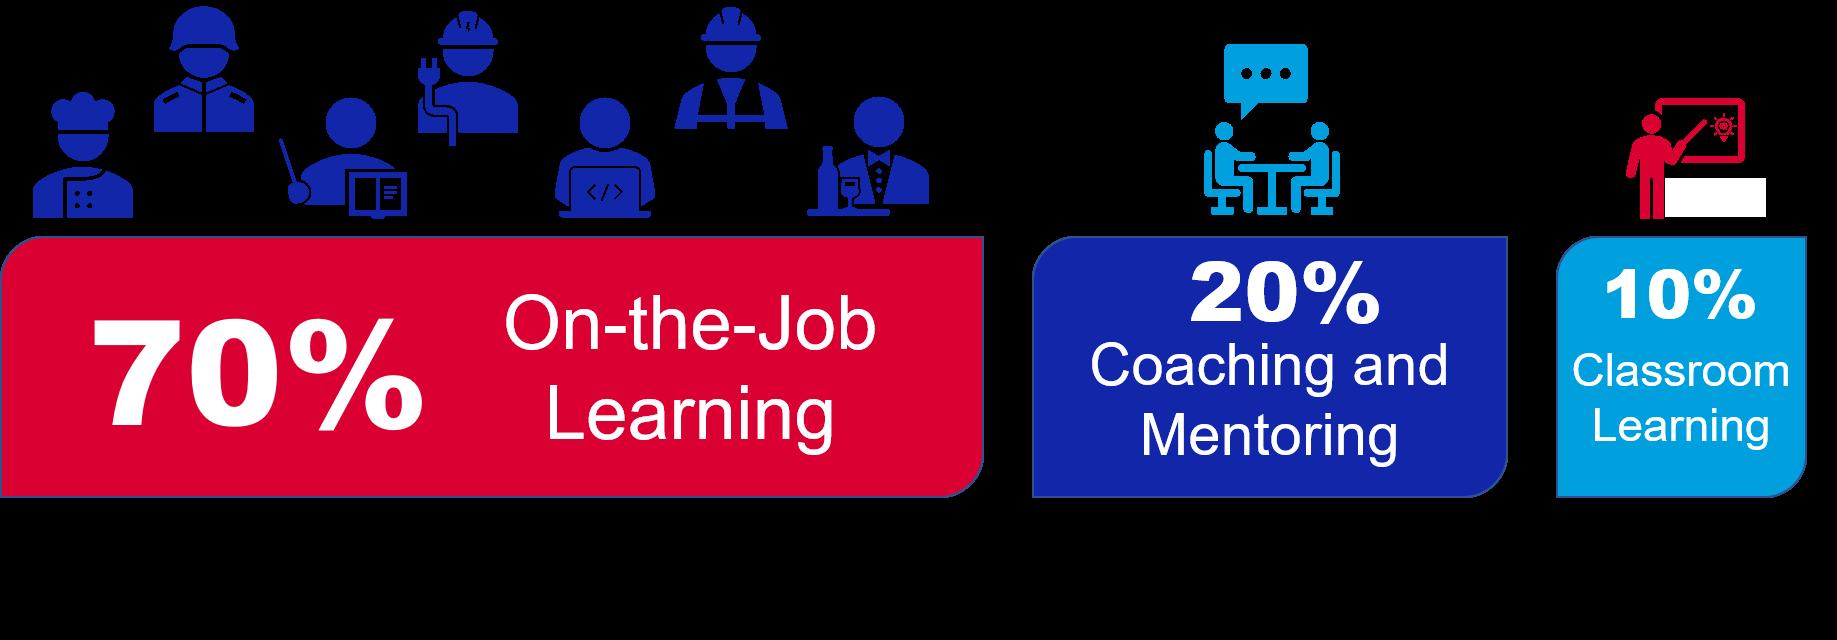 70:20:10 Model of Learning